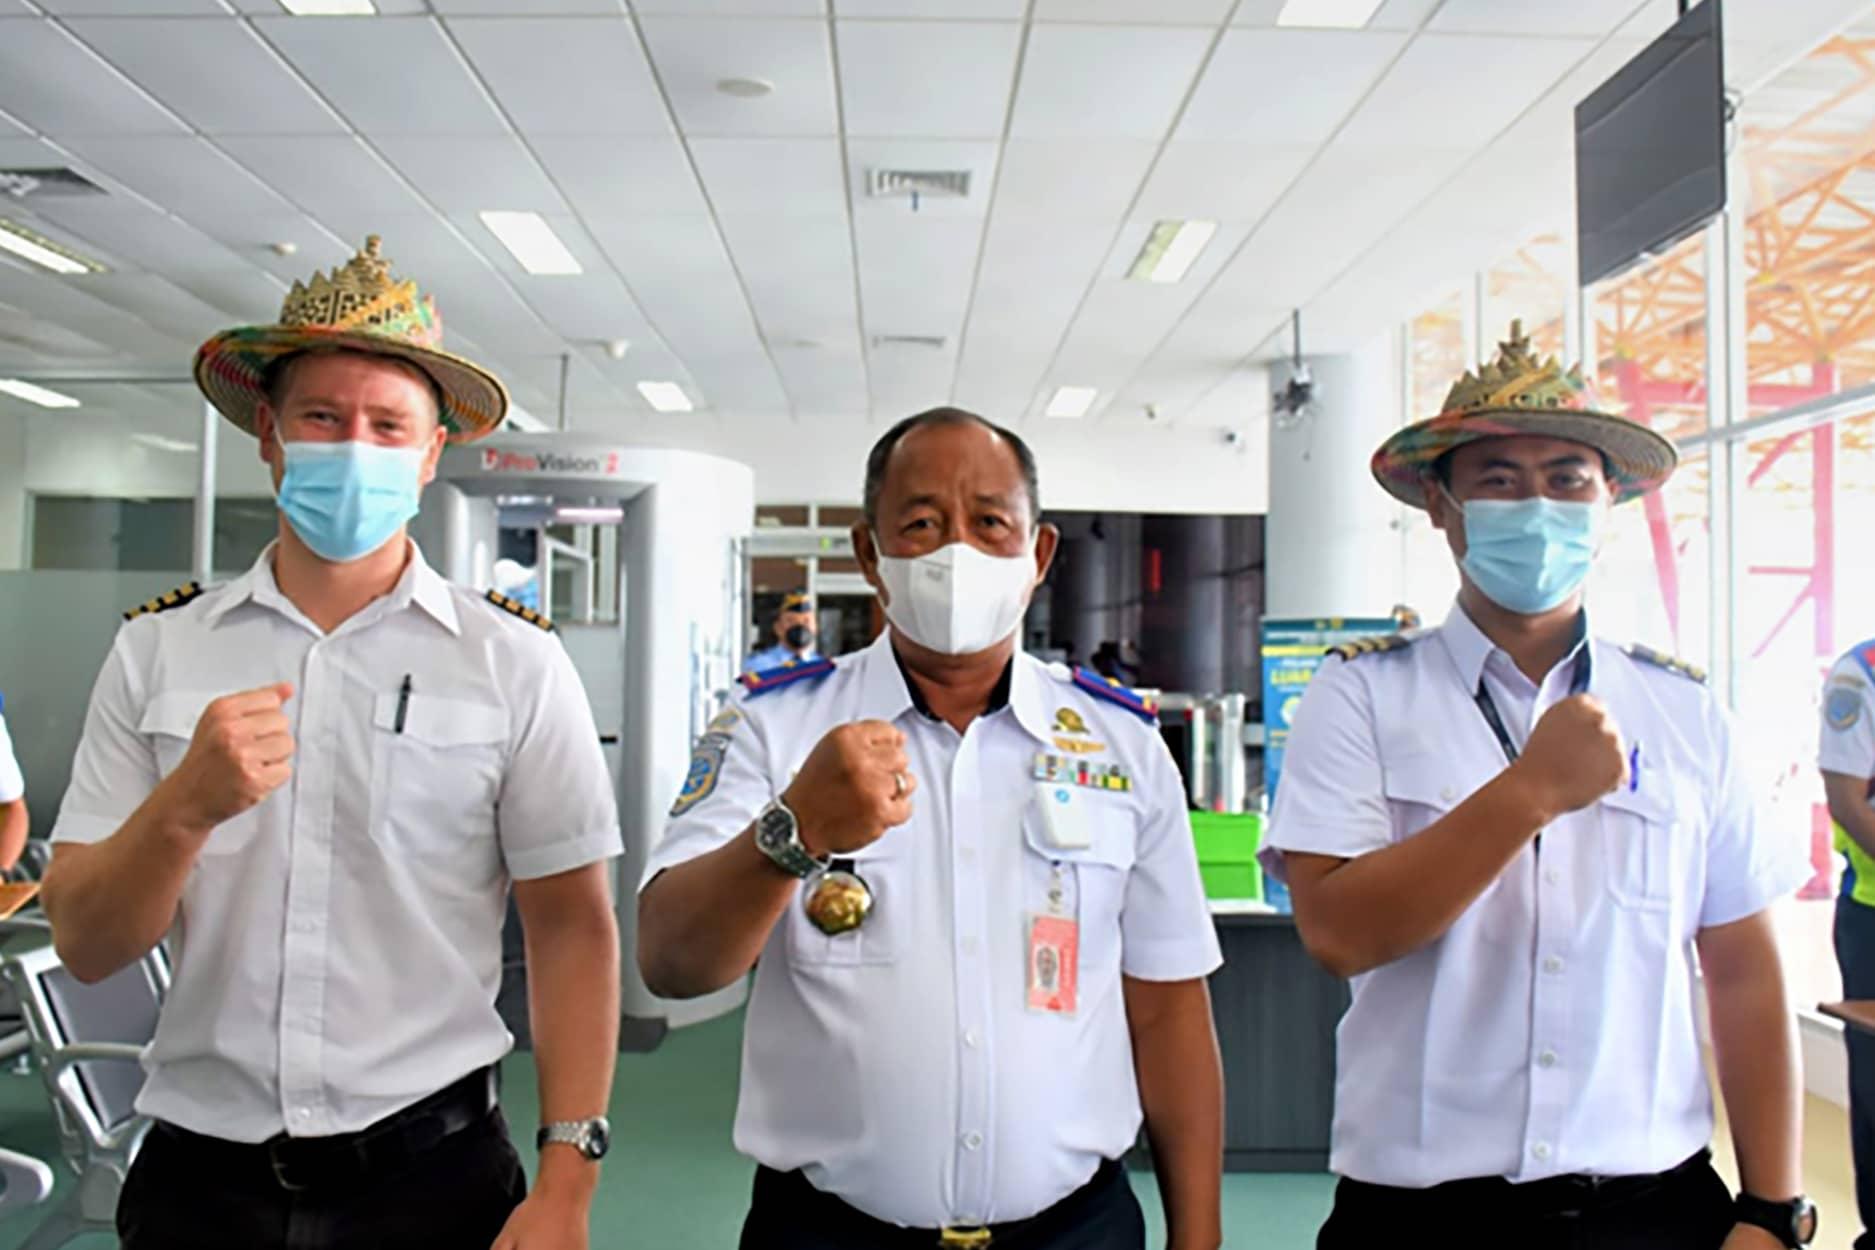 Agus Priyanto bersama pilot 1 - Kabandara Juwata Agus Priyanto; Motivasi Diri & Disiplin